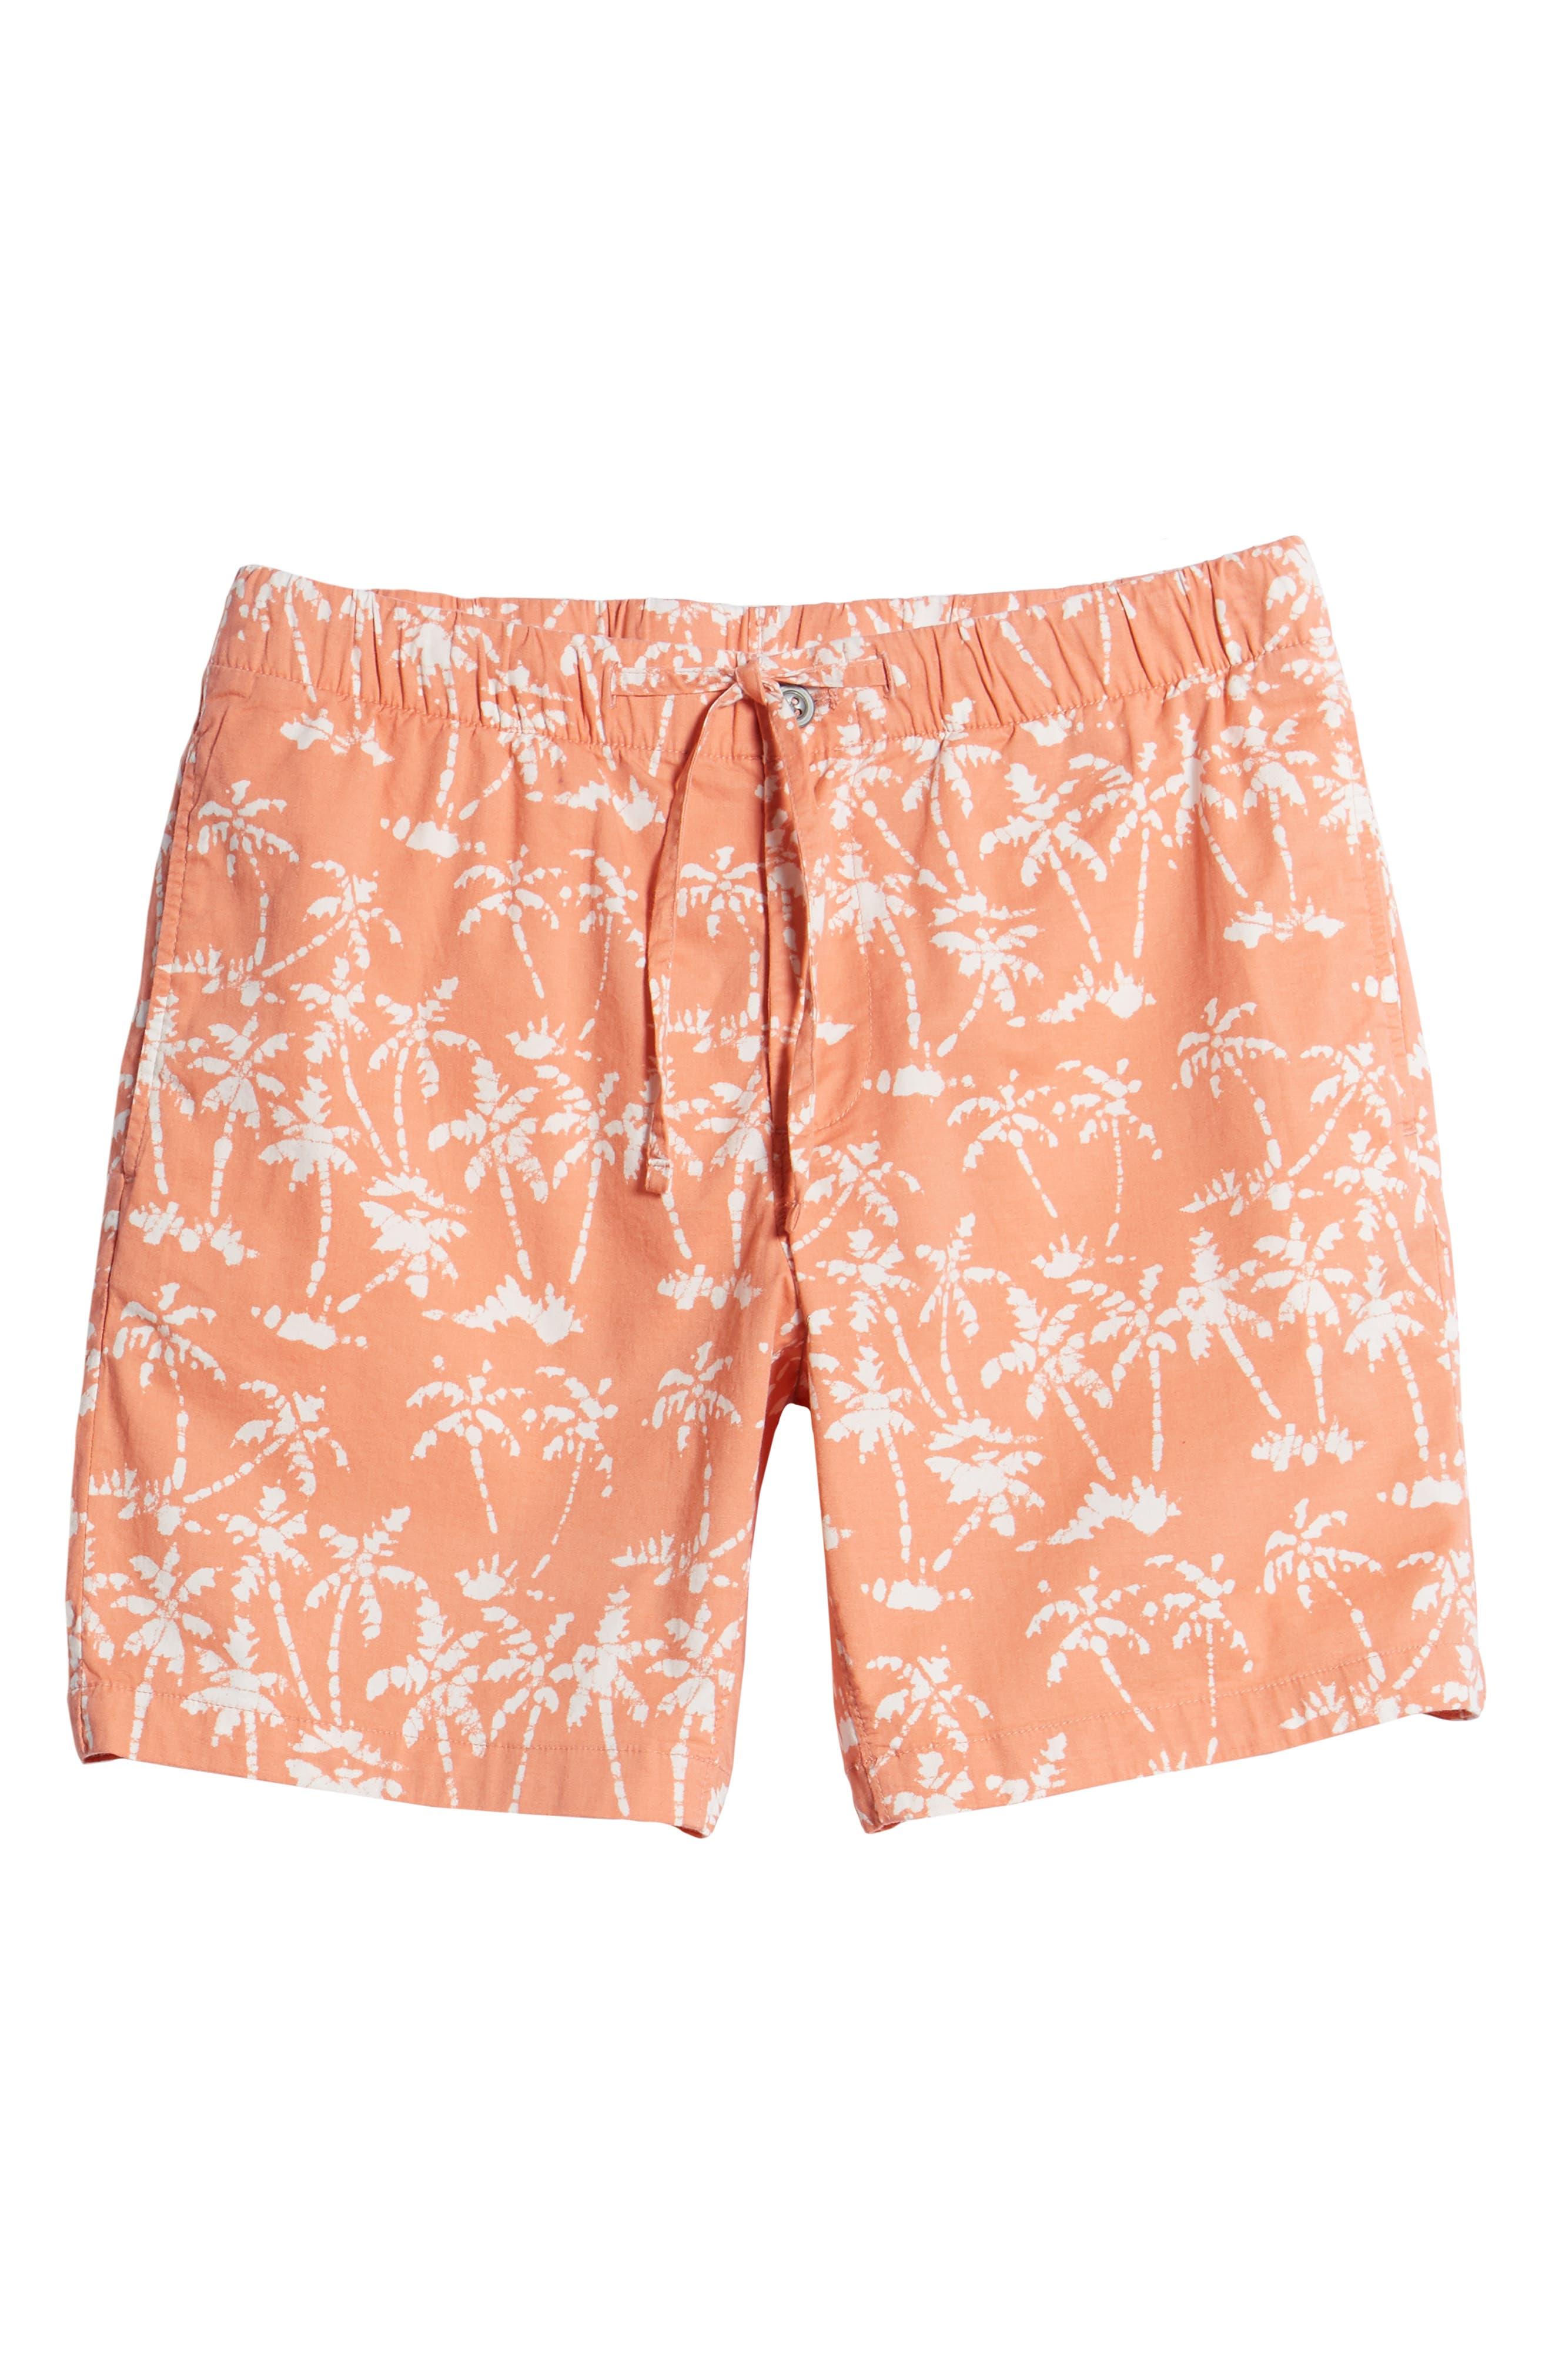 Print Beach Shorts,                             Alternate thumbnail 6, color,                             800